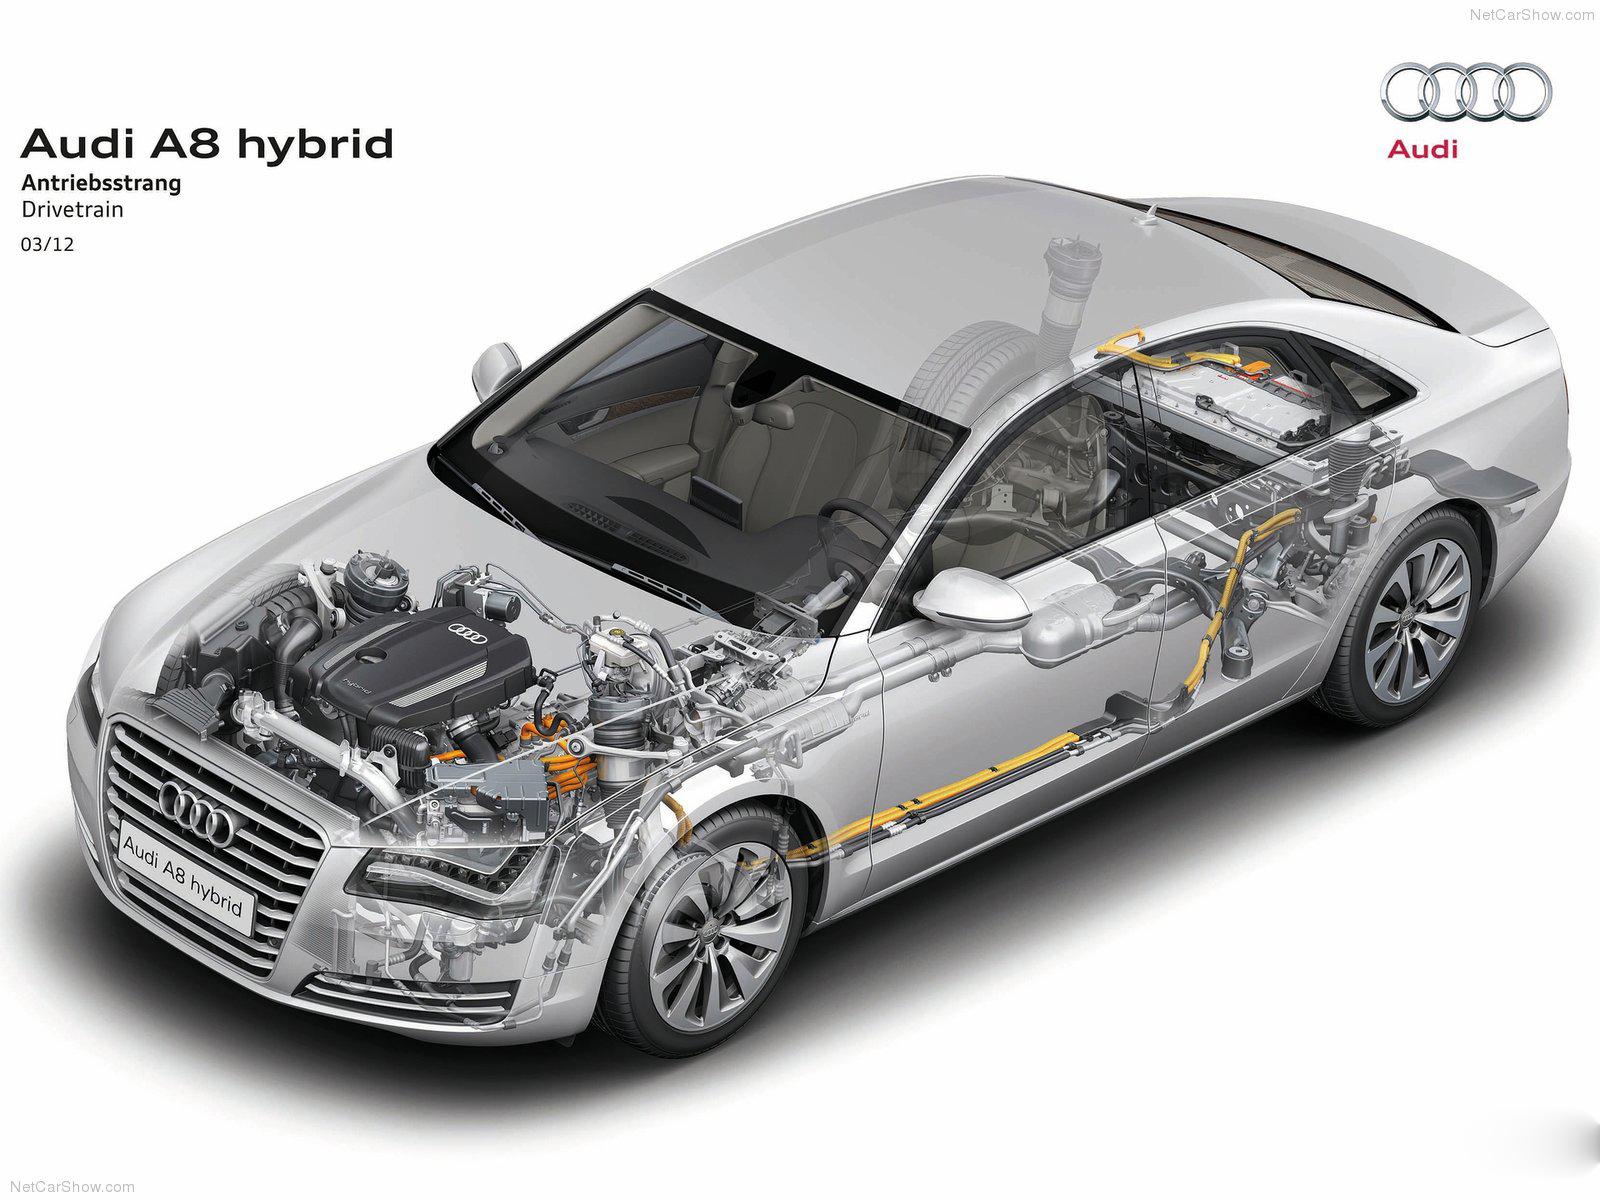 Audi D2 Engine Diagram - Wiring Diagram Direct hill-produce -  hill-produce.siciliabeb.it | Audi D2 Engine Diagram |  | hill-produce.siciliabeb.it